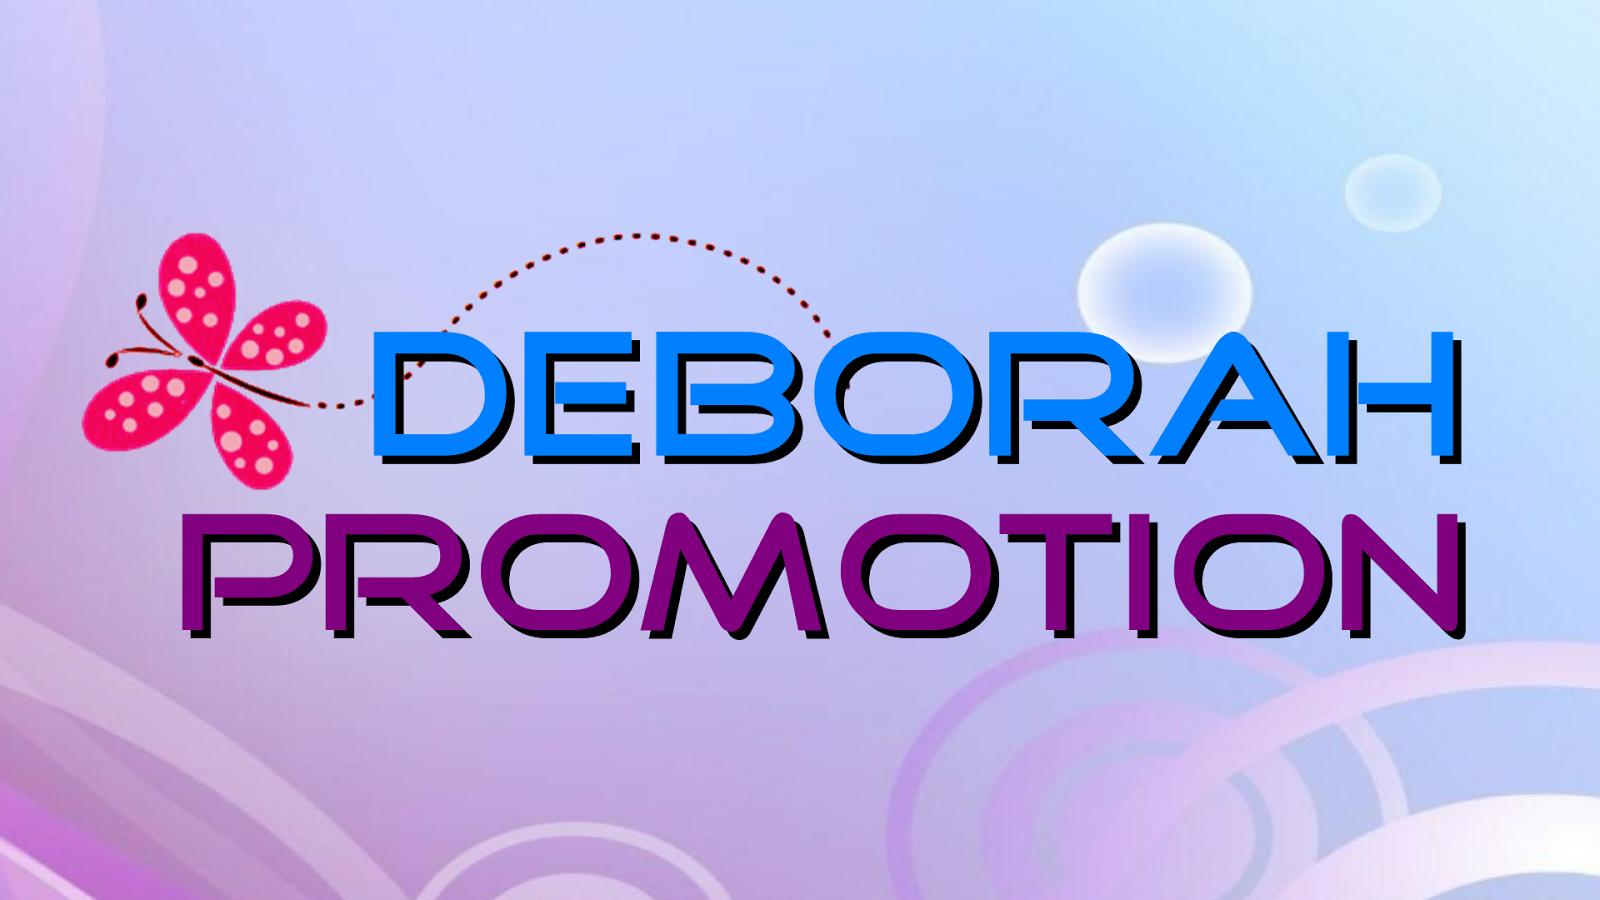 Deborah Promotions